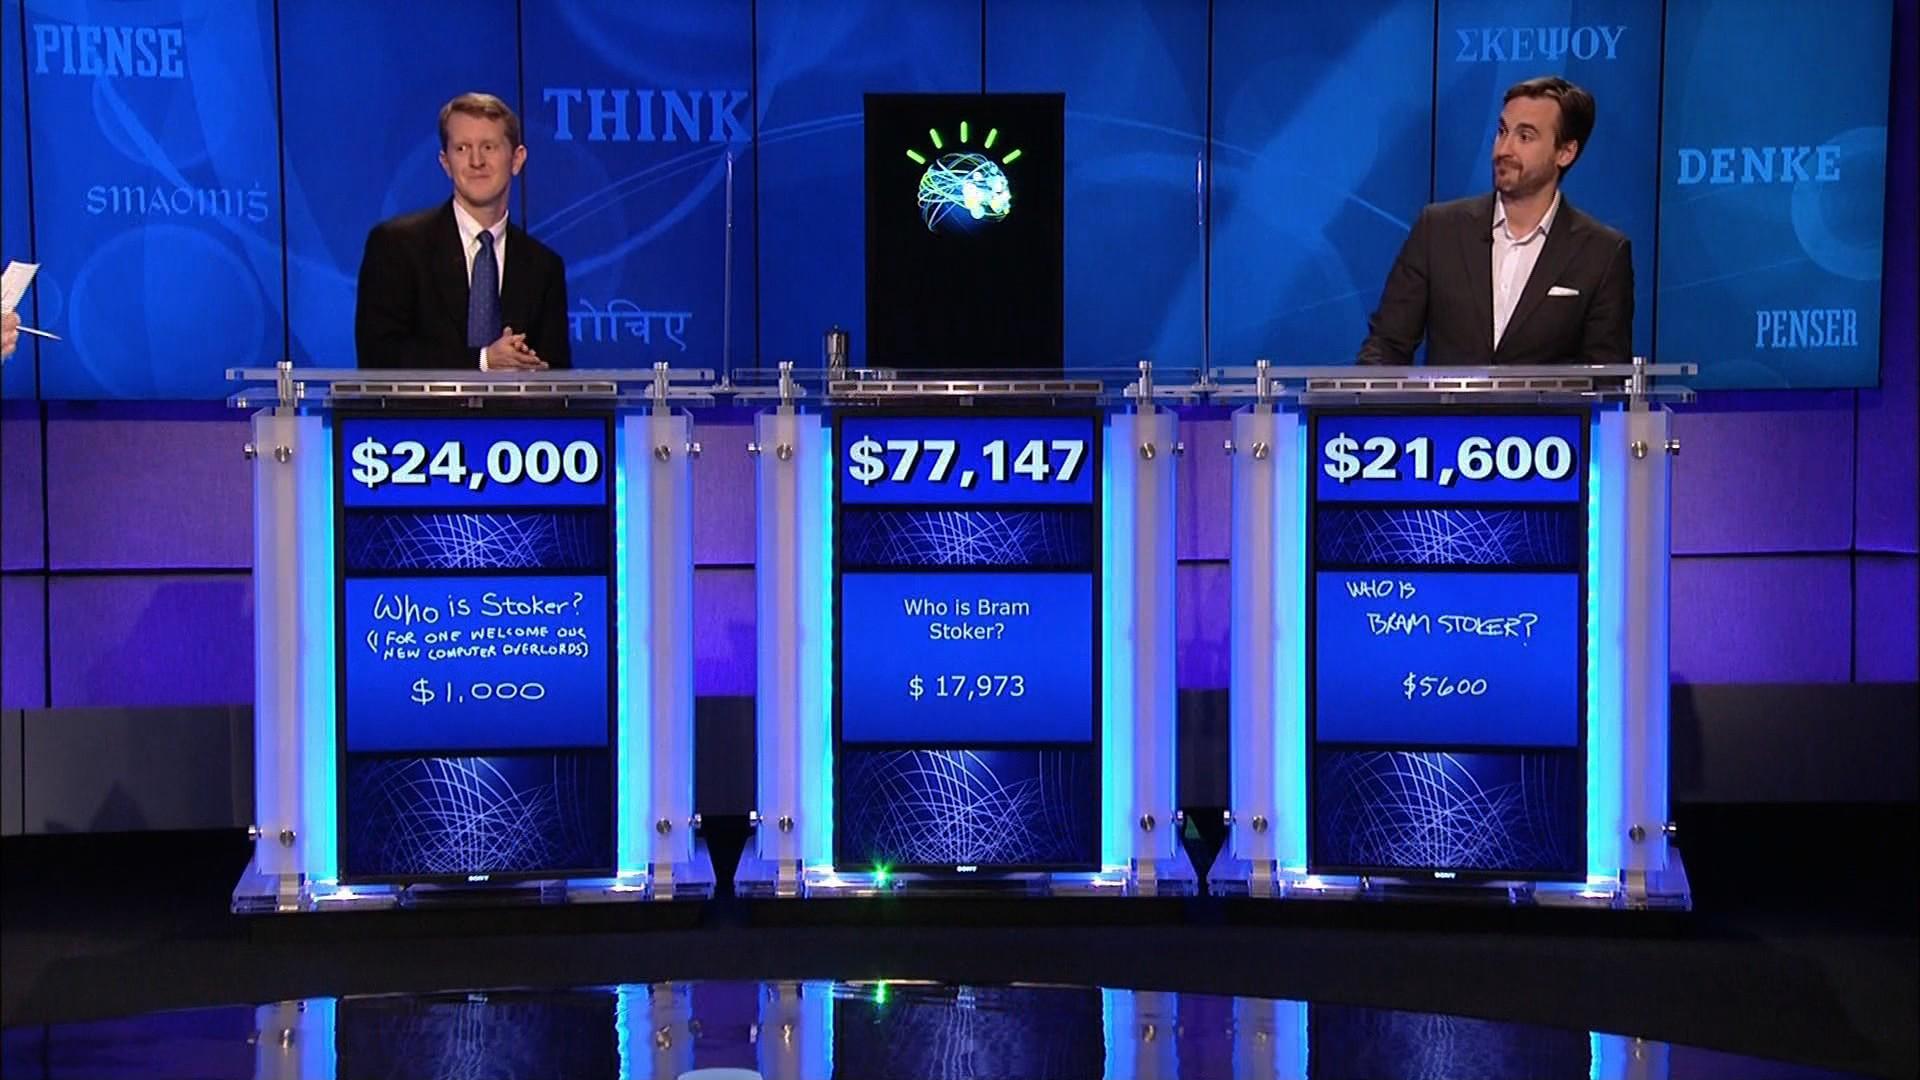 IBM Watson - supercomputador